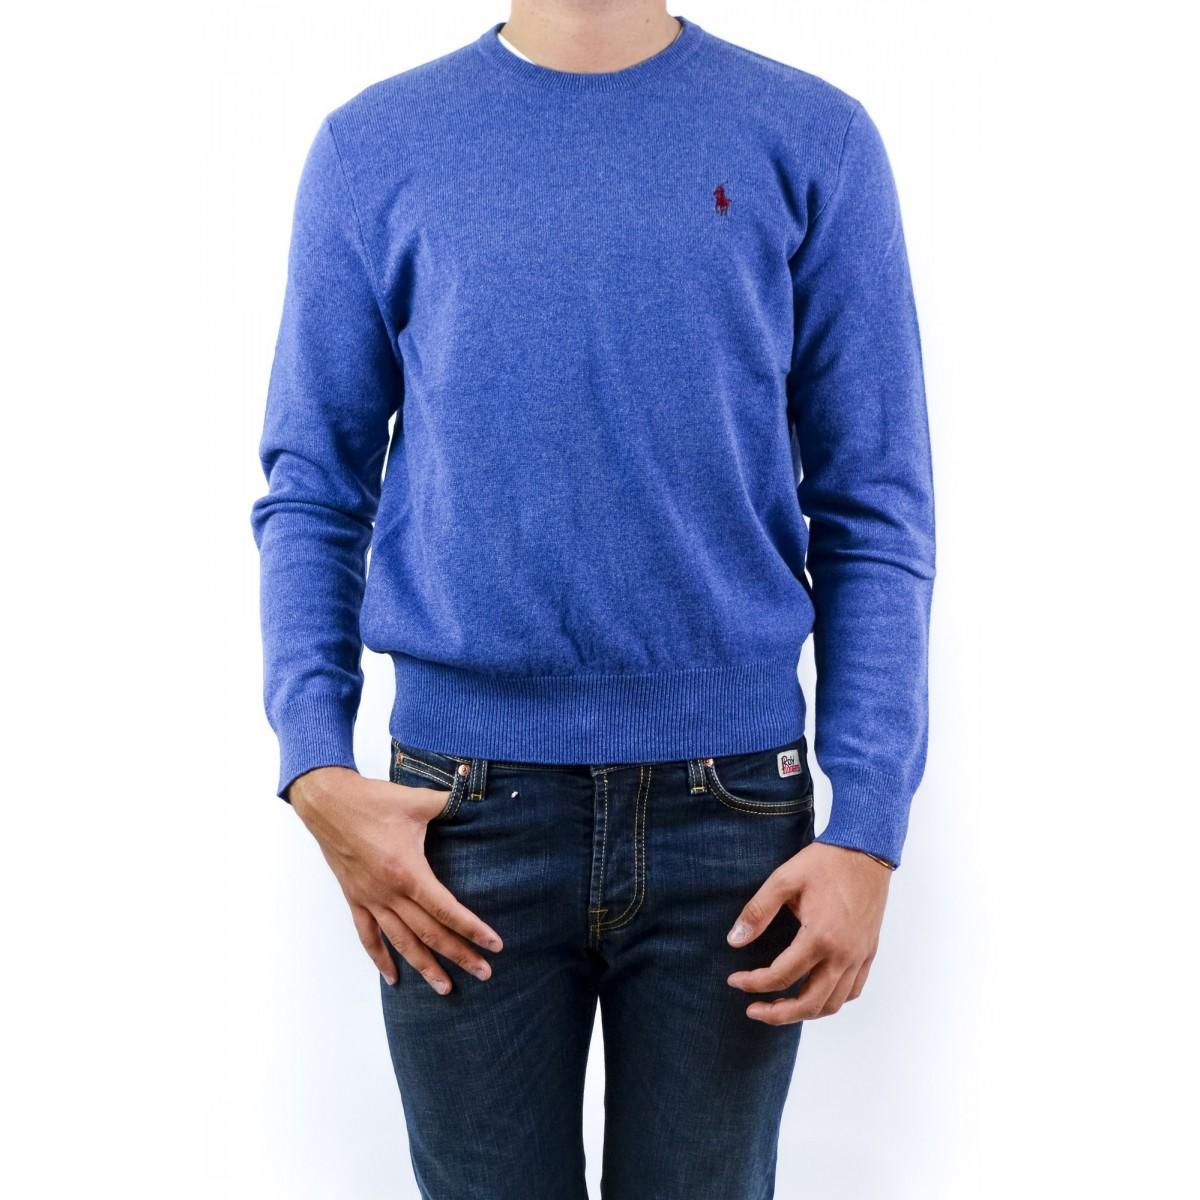 Jumper Ralph Lauren Man - A42Scn07W8793 A488Y - Melange azzurro